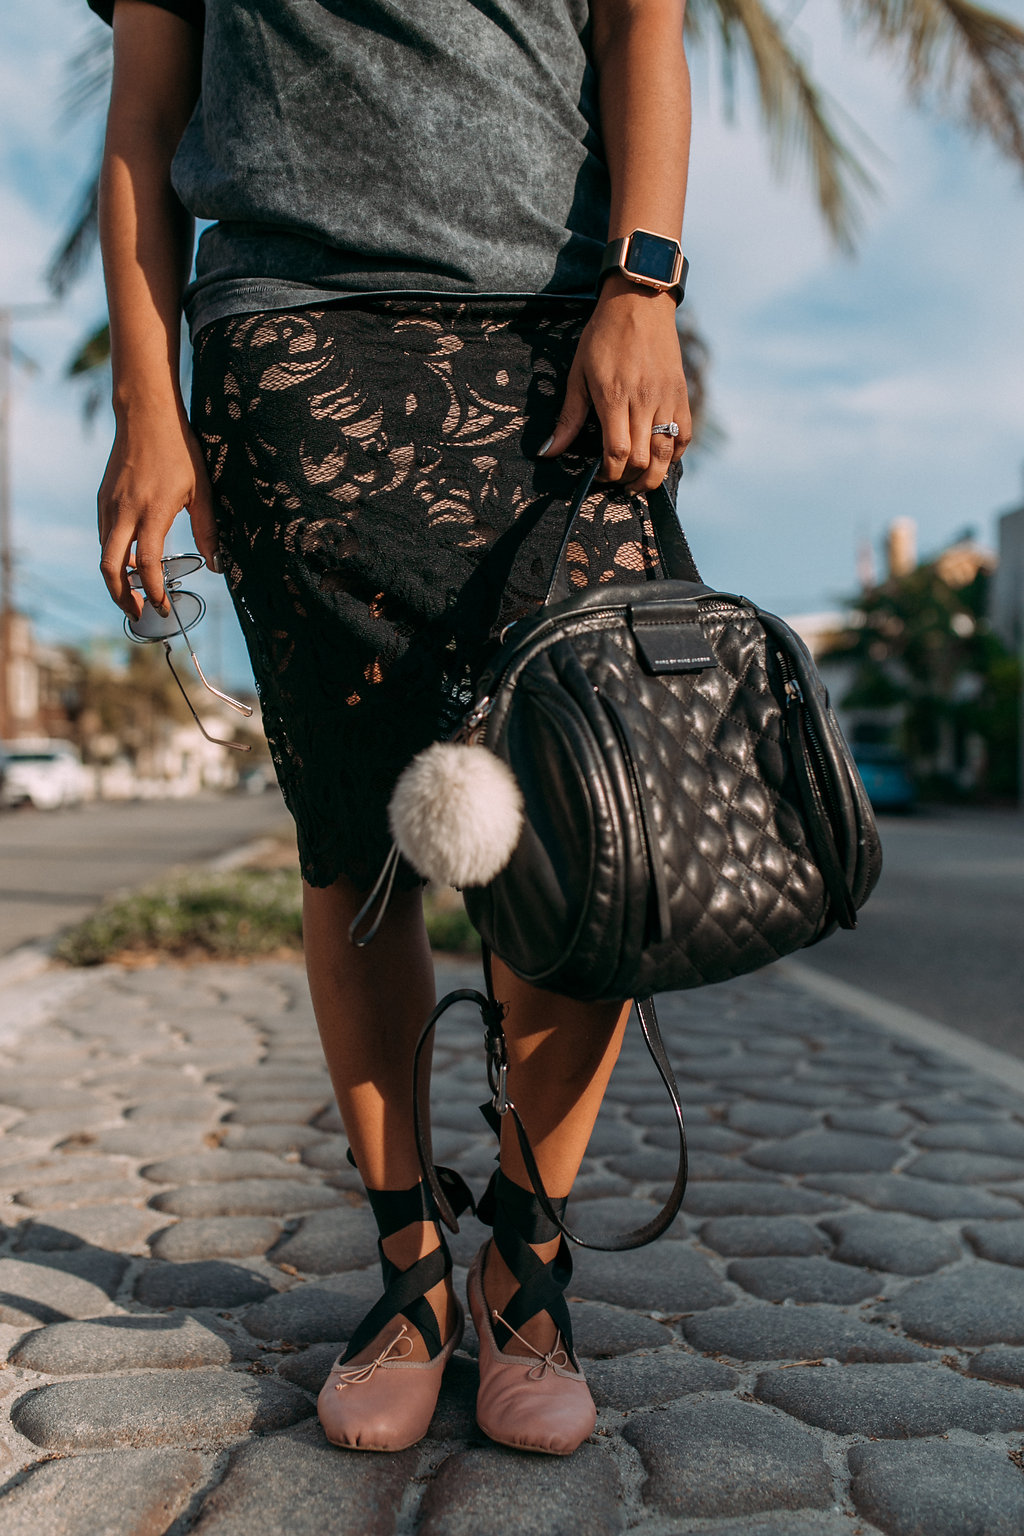 Zara Ballet Slippers + Chloe sunnies // https://thehautemommie.com/3-outfits-in-1/